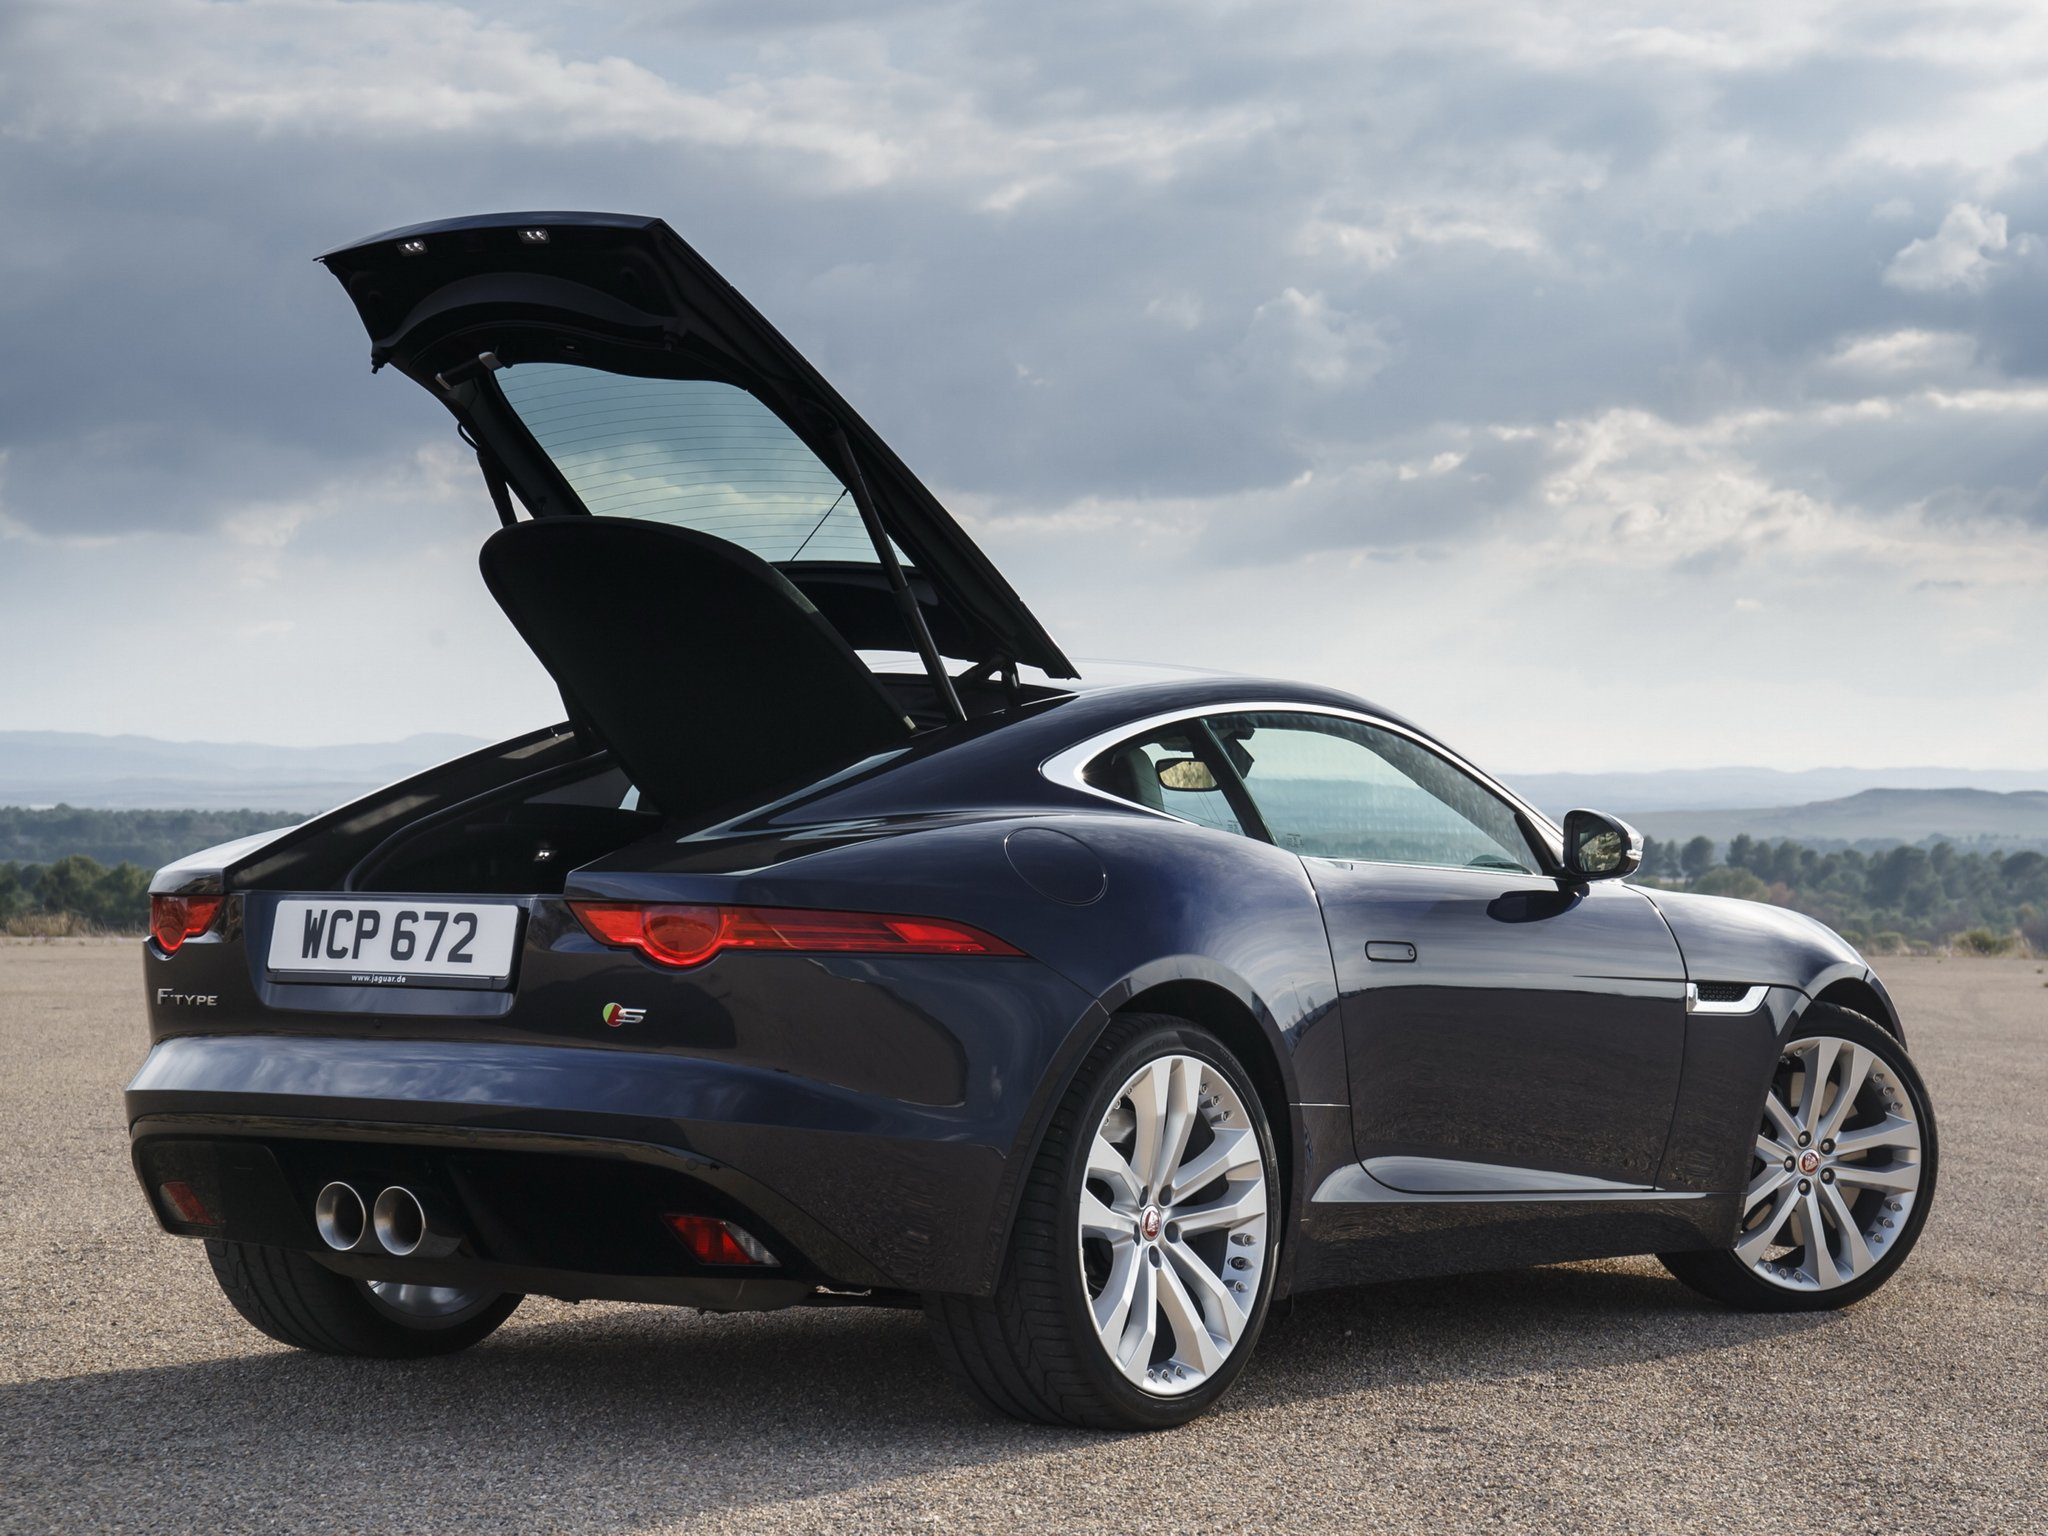 2014 Jaguar F Type S Coupe Ew Wallpaper | 2048x1536 | 331759 | WallpaperUP